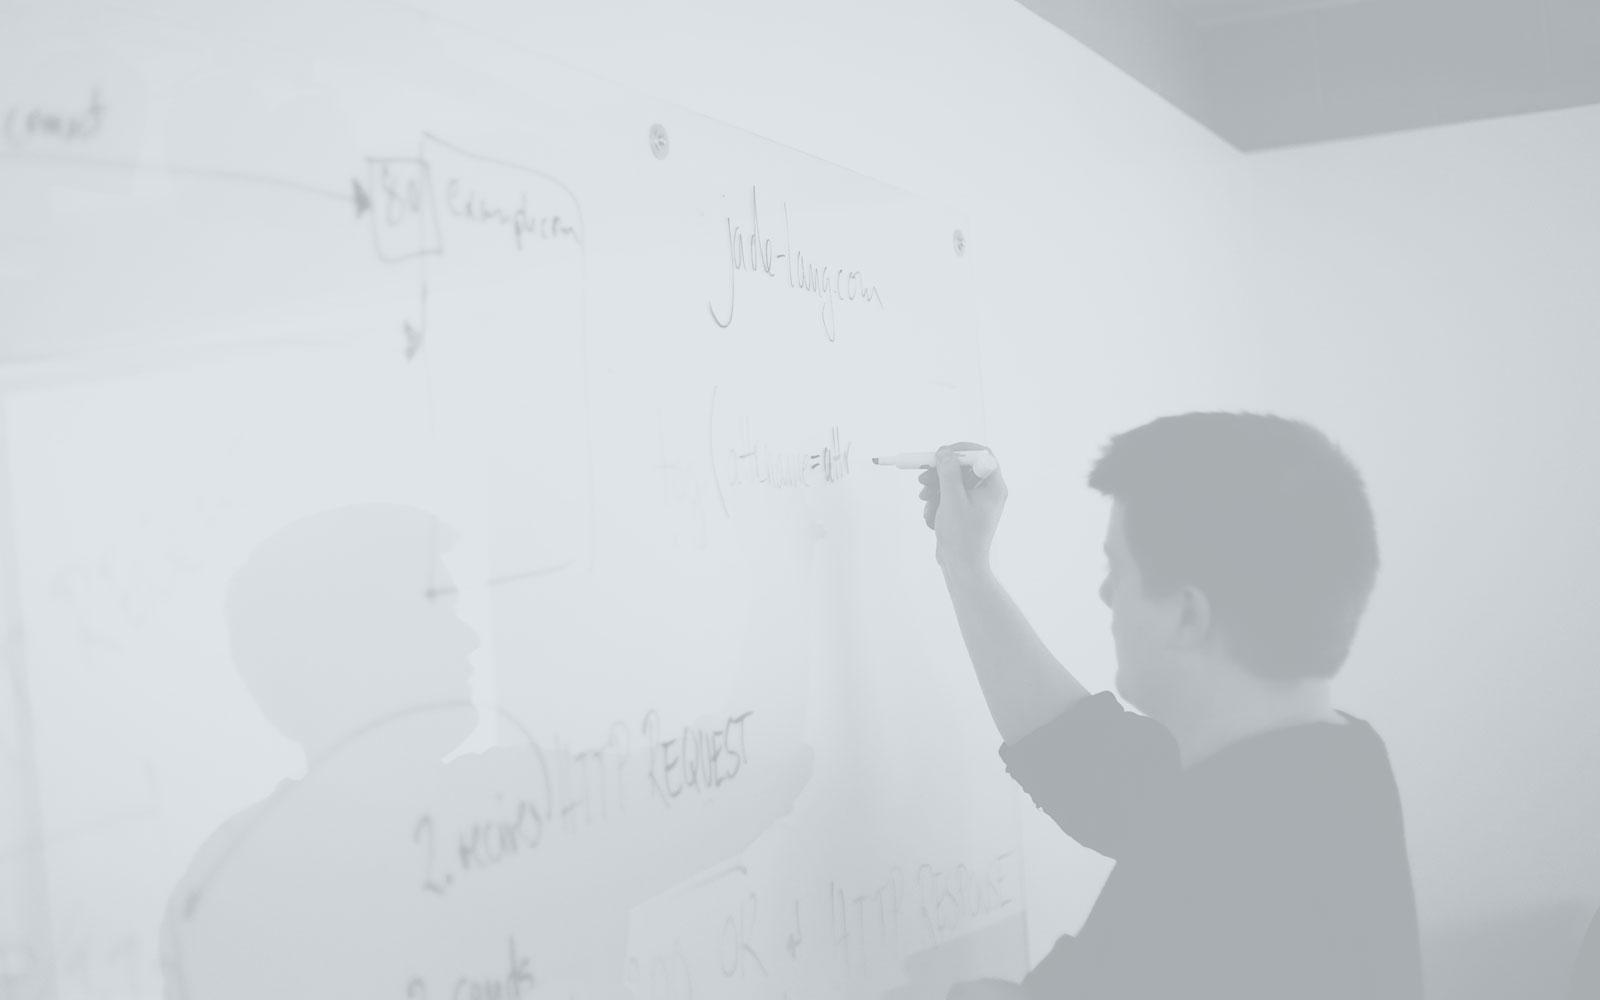 bg-whiteboard